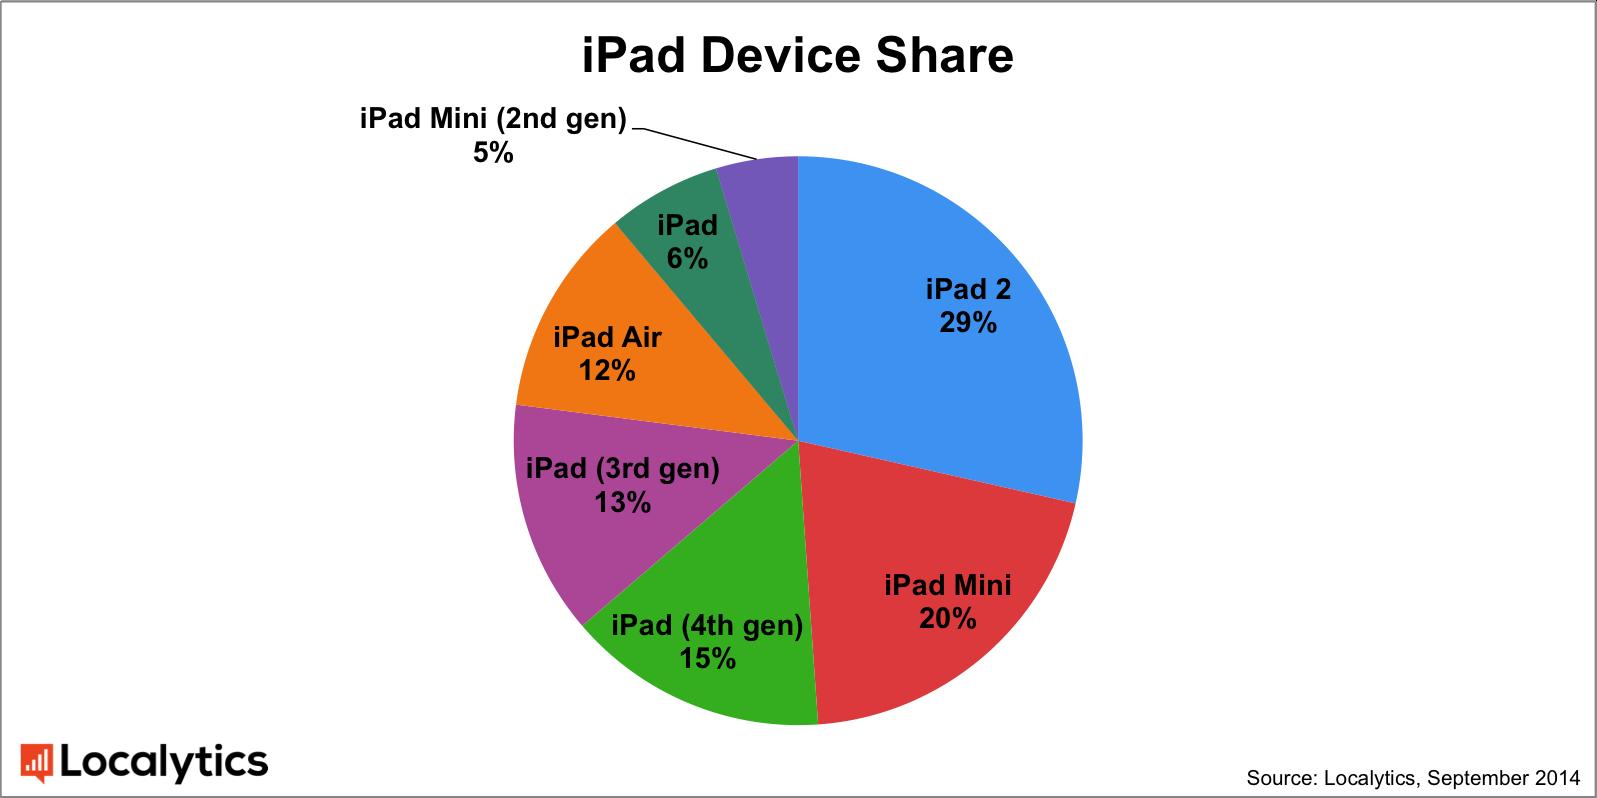 Ipad device share